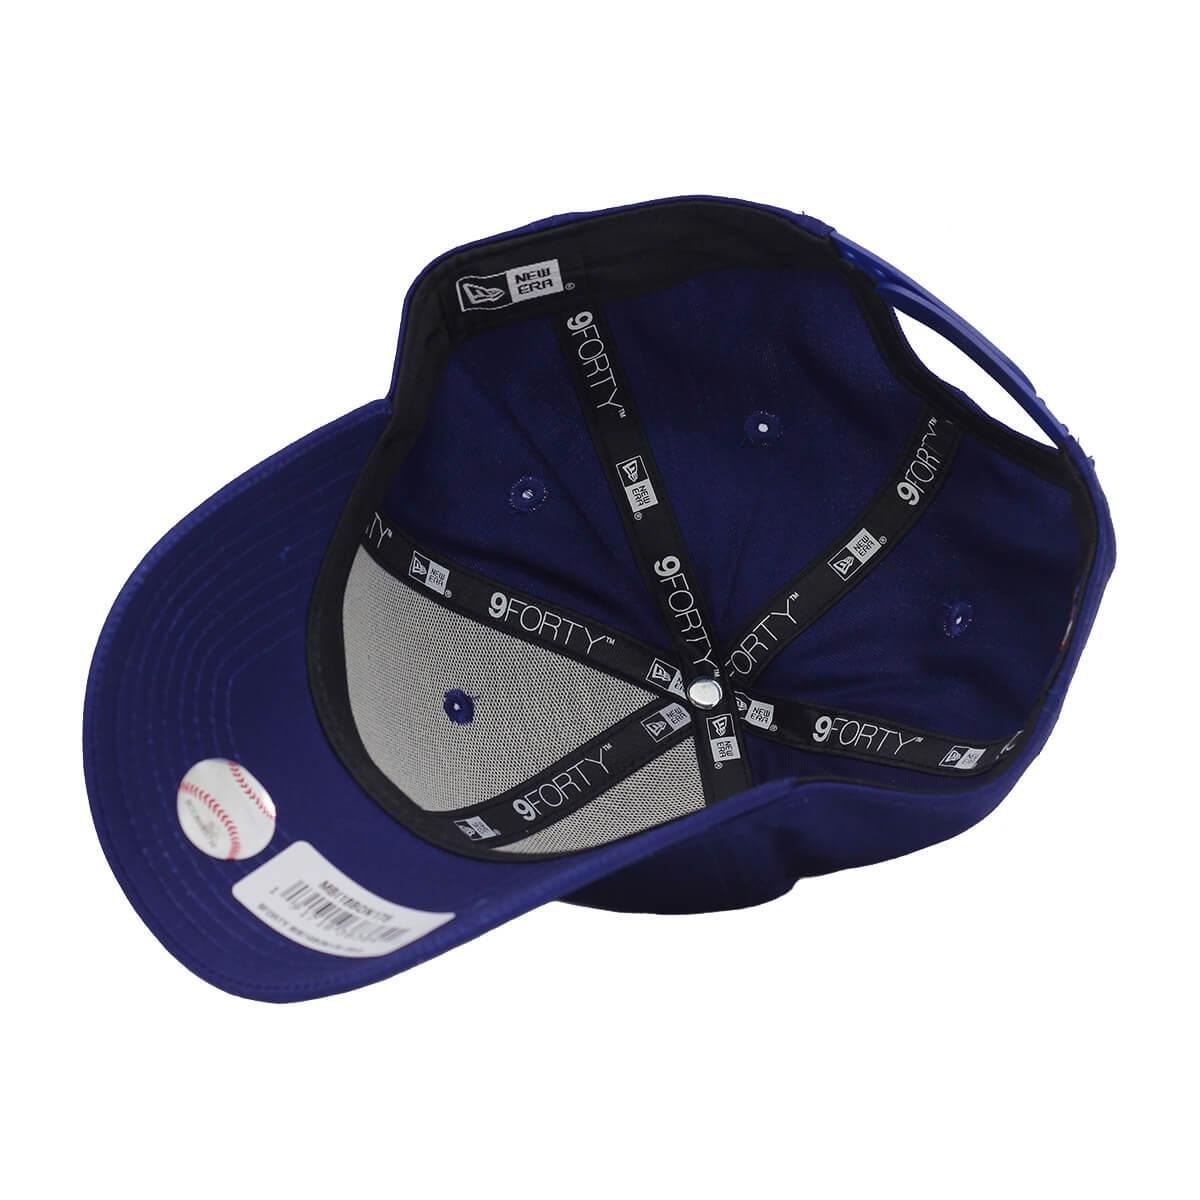 Boné Aba Curva Los Angeles Dodgers BON175 New Era - Boné e Chapéu de ... 0229780596e